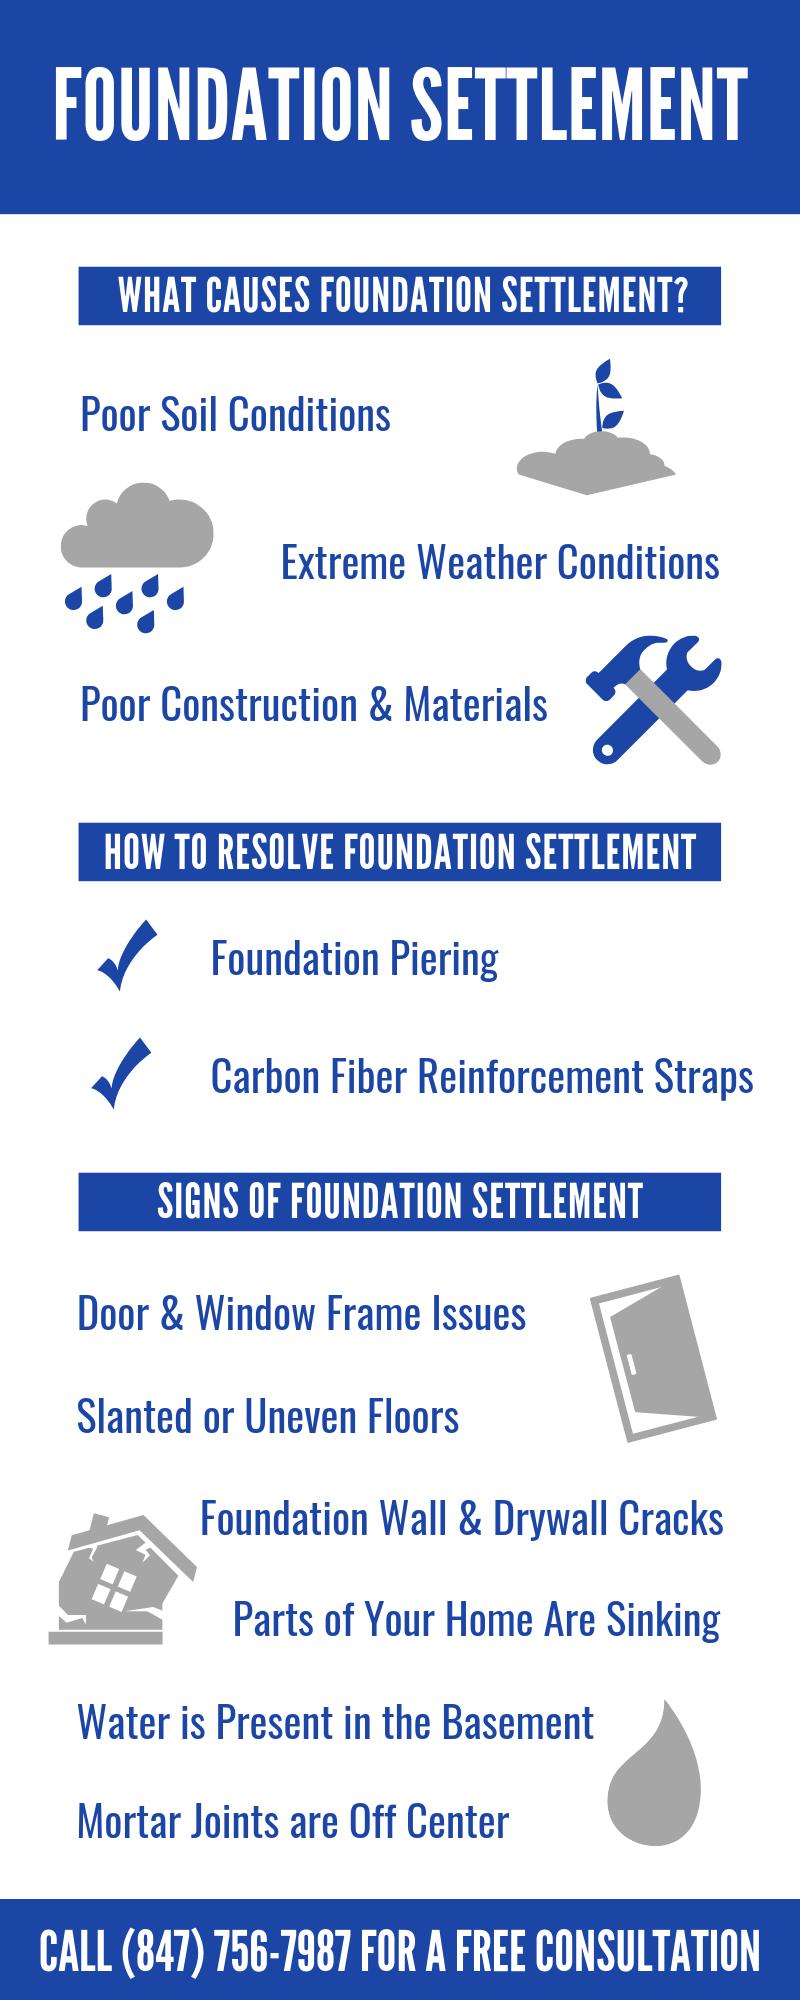 Foundation Settlement - Chicago Foundation Settling Repairs